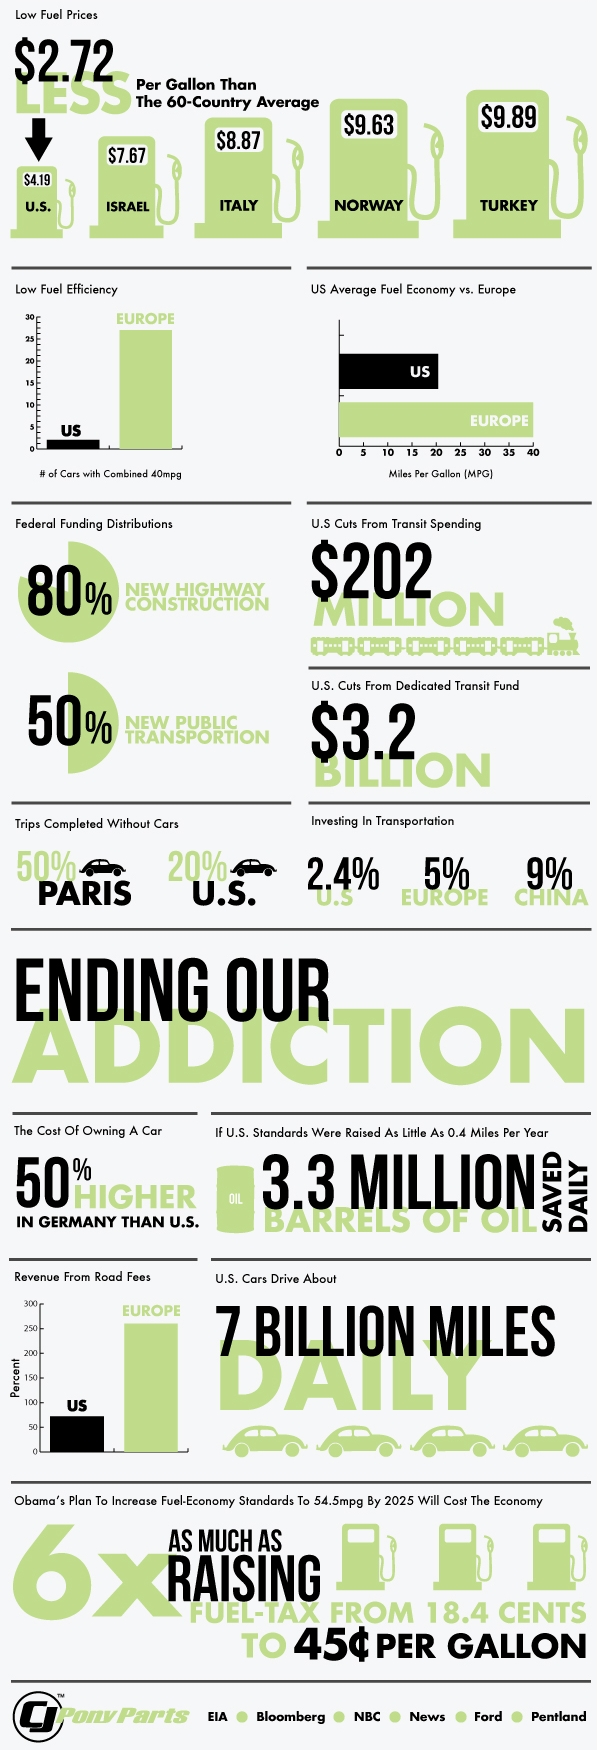 America's Addiction to Oil Infographic (CJPonyParts.com)